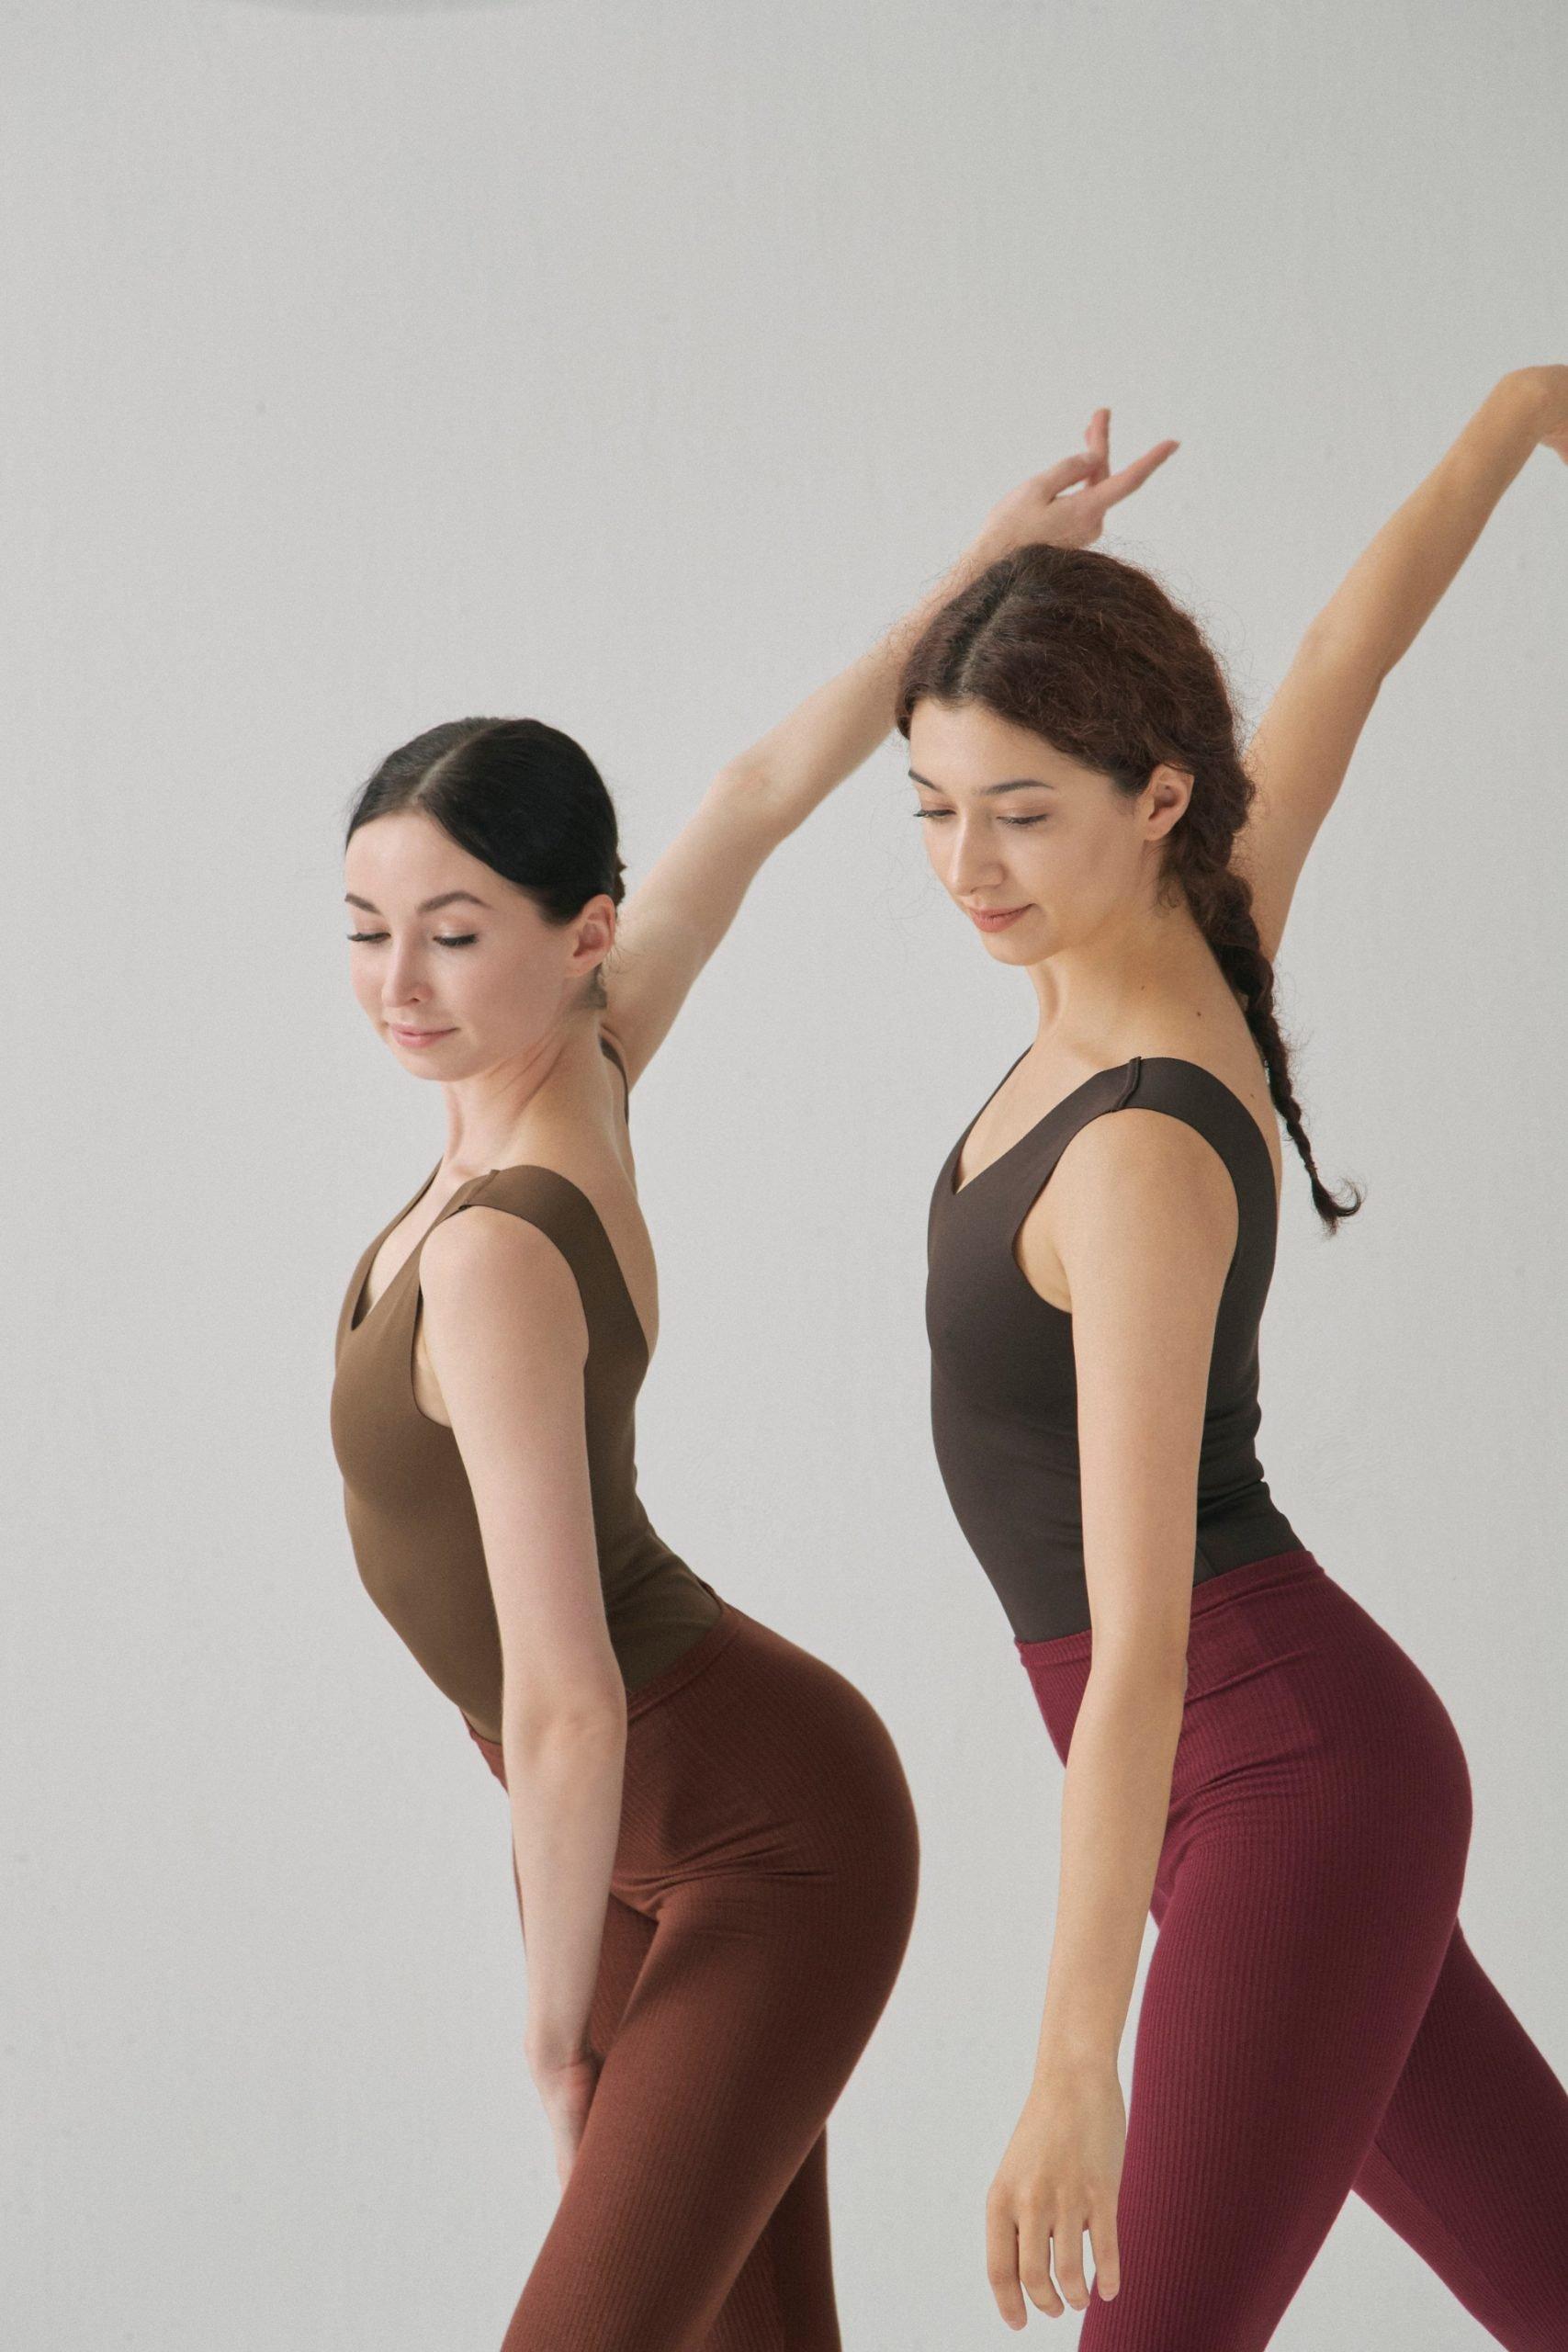 femmes qui dansent en tenue SMK